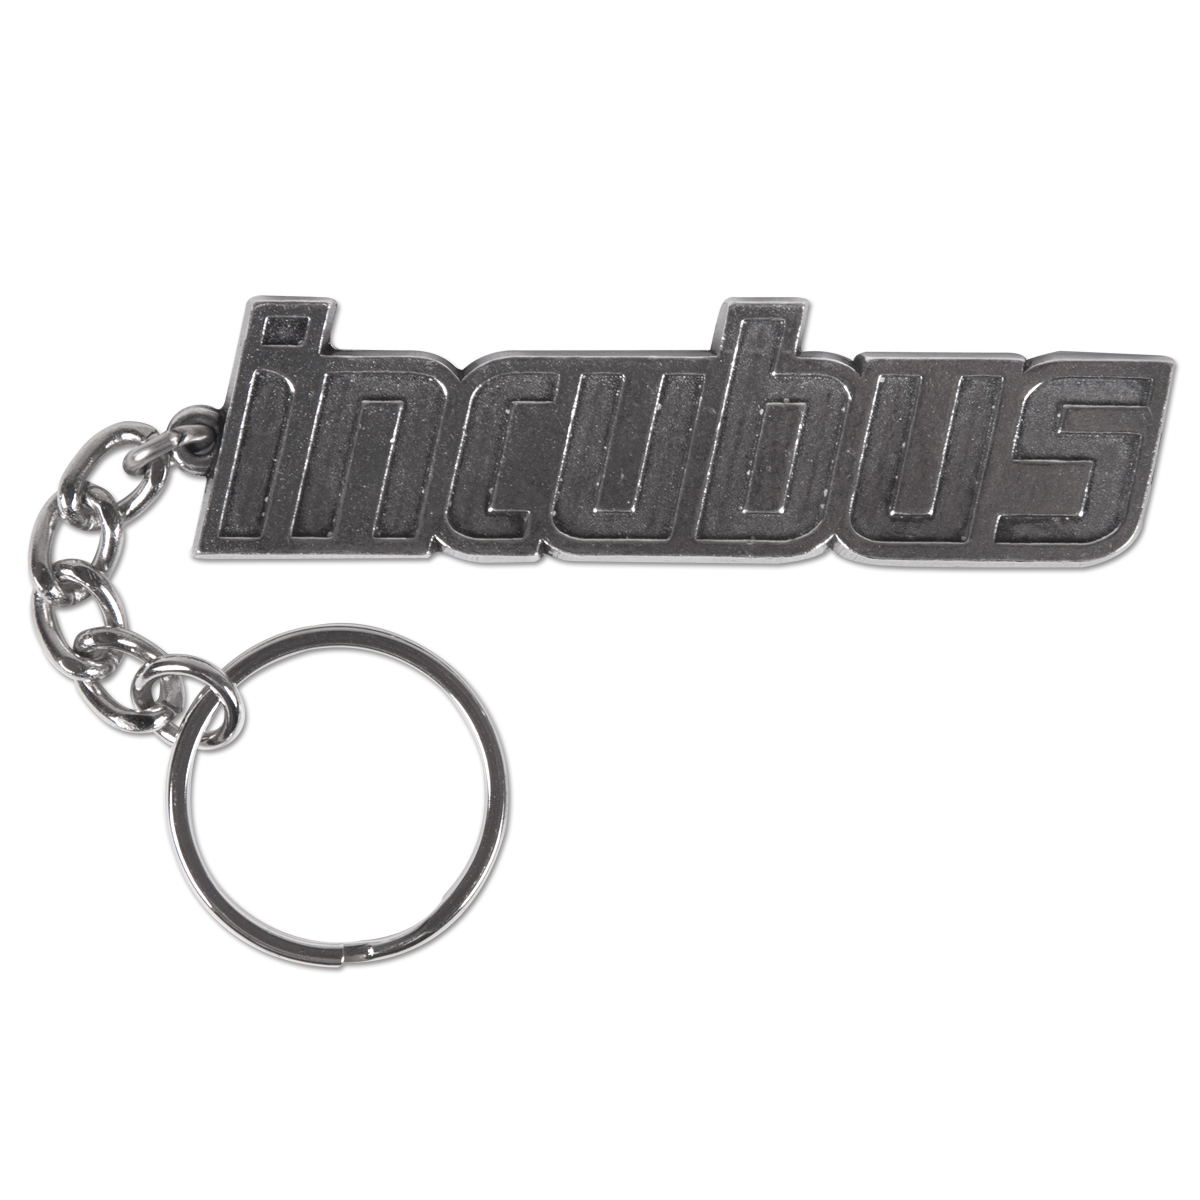 Incubus Logo Metal Keychain